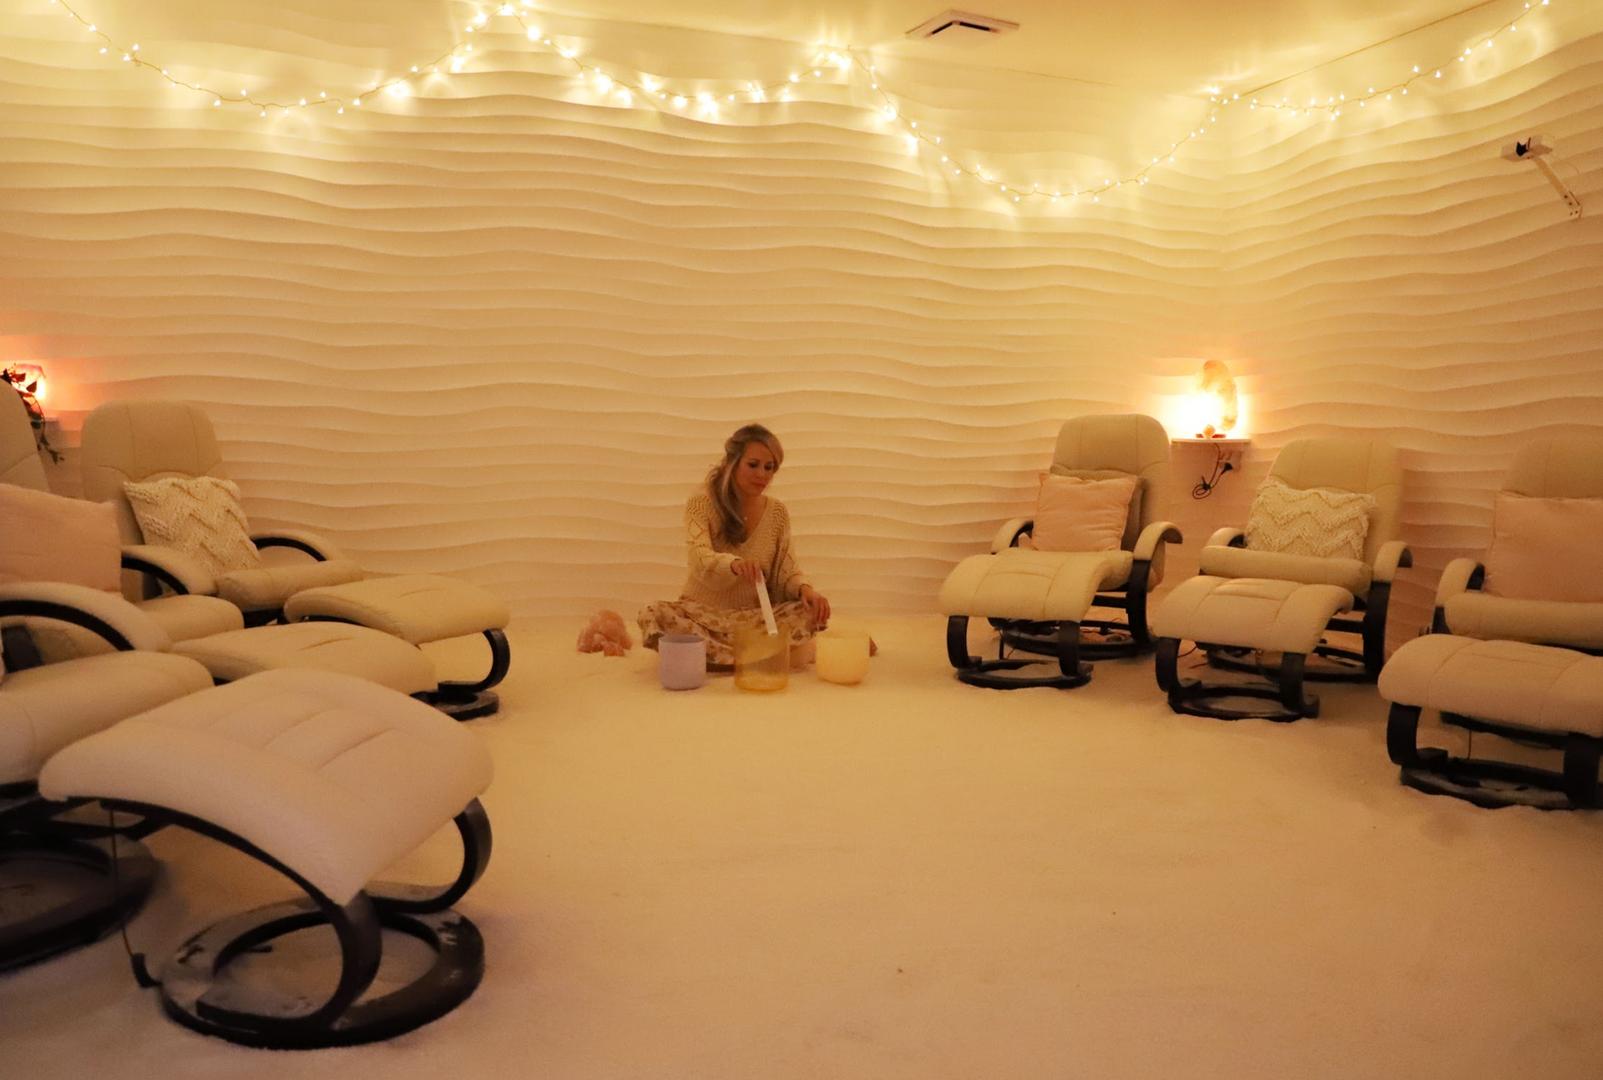 surfcoast wellness rooms-salt therapy-infrared sauna-float-tank-meditation-yoga-massage-reiki-energy healing-image2